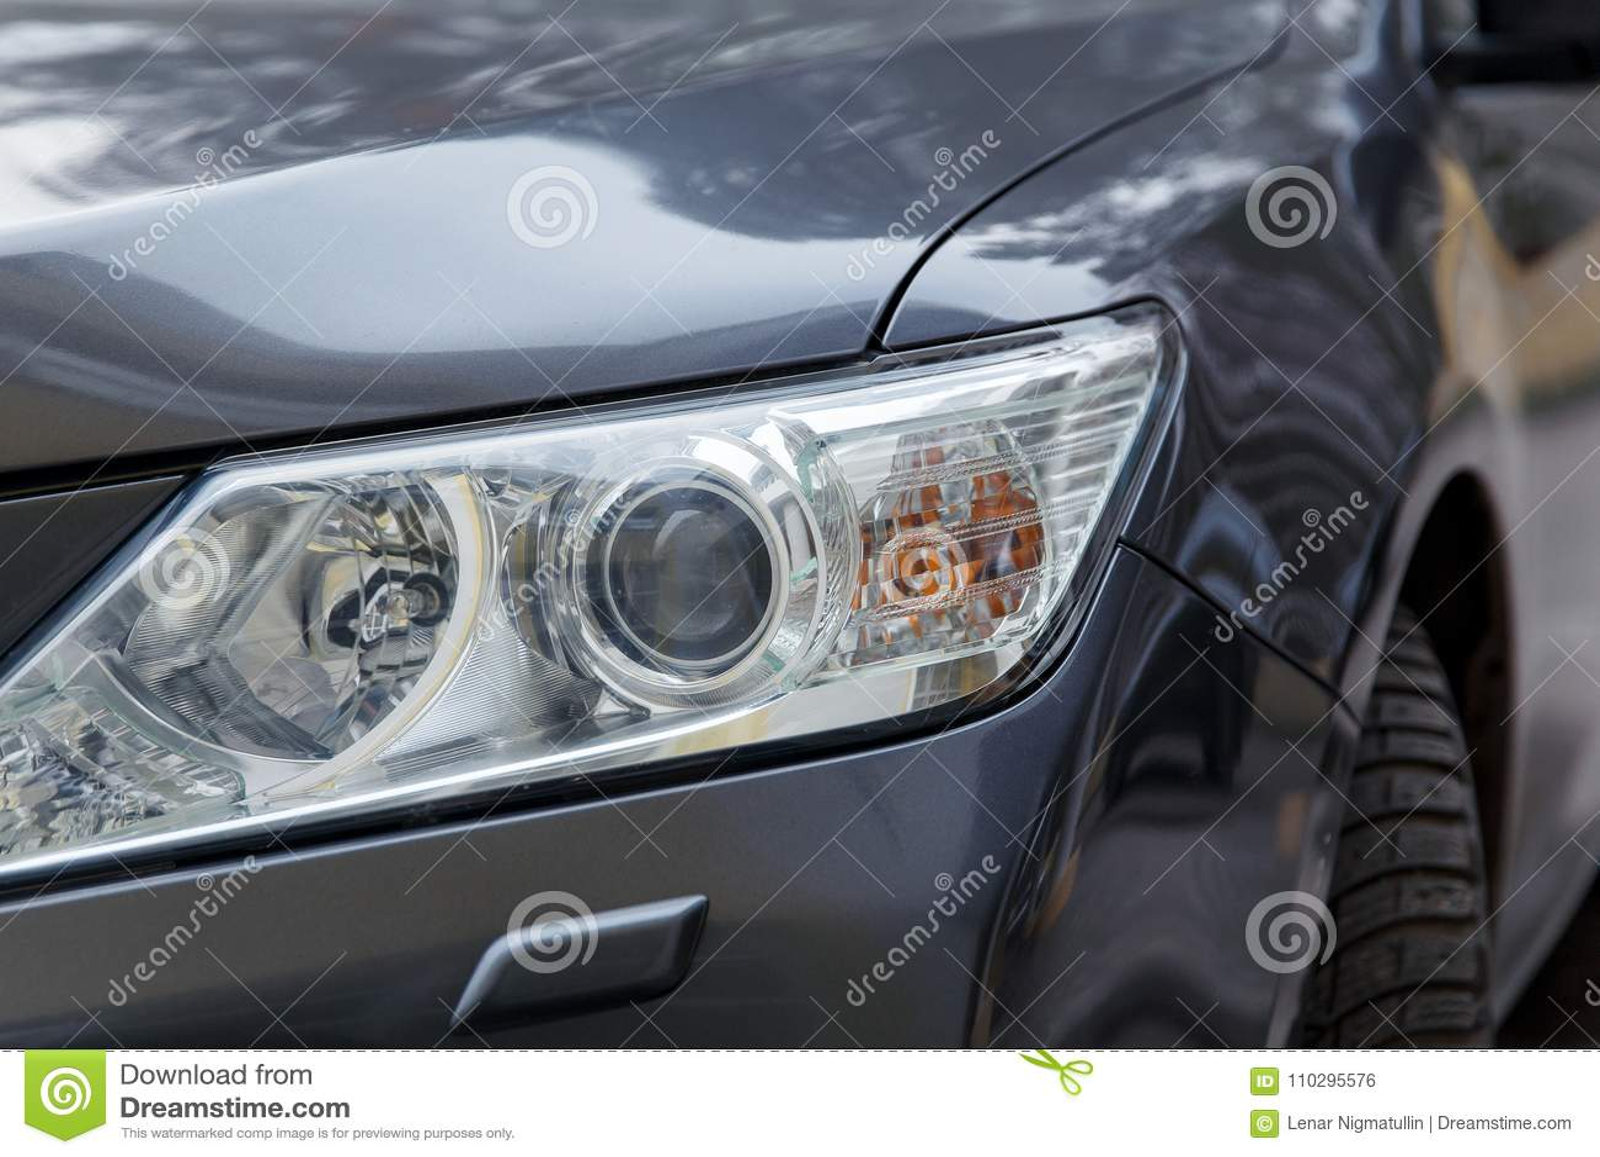 Bumper Black New Car Headlamp Glossy Coating Stock Photo Image